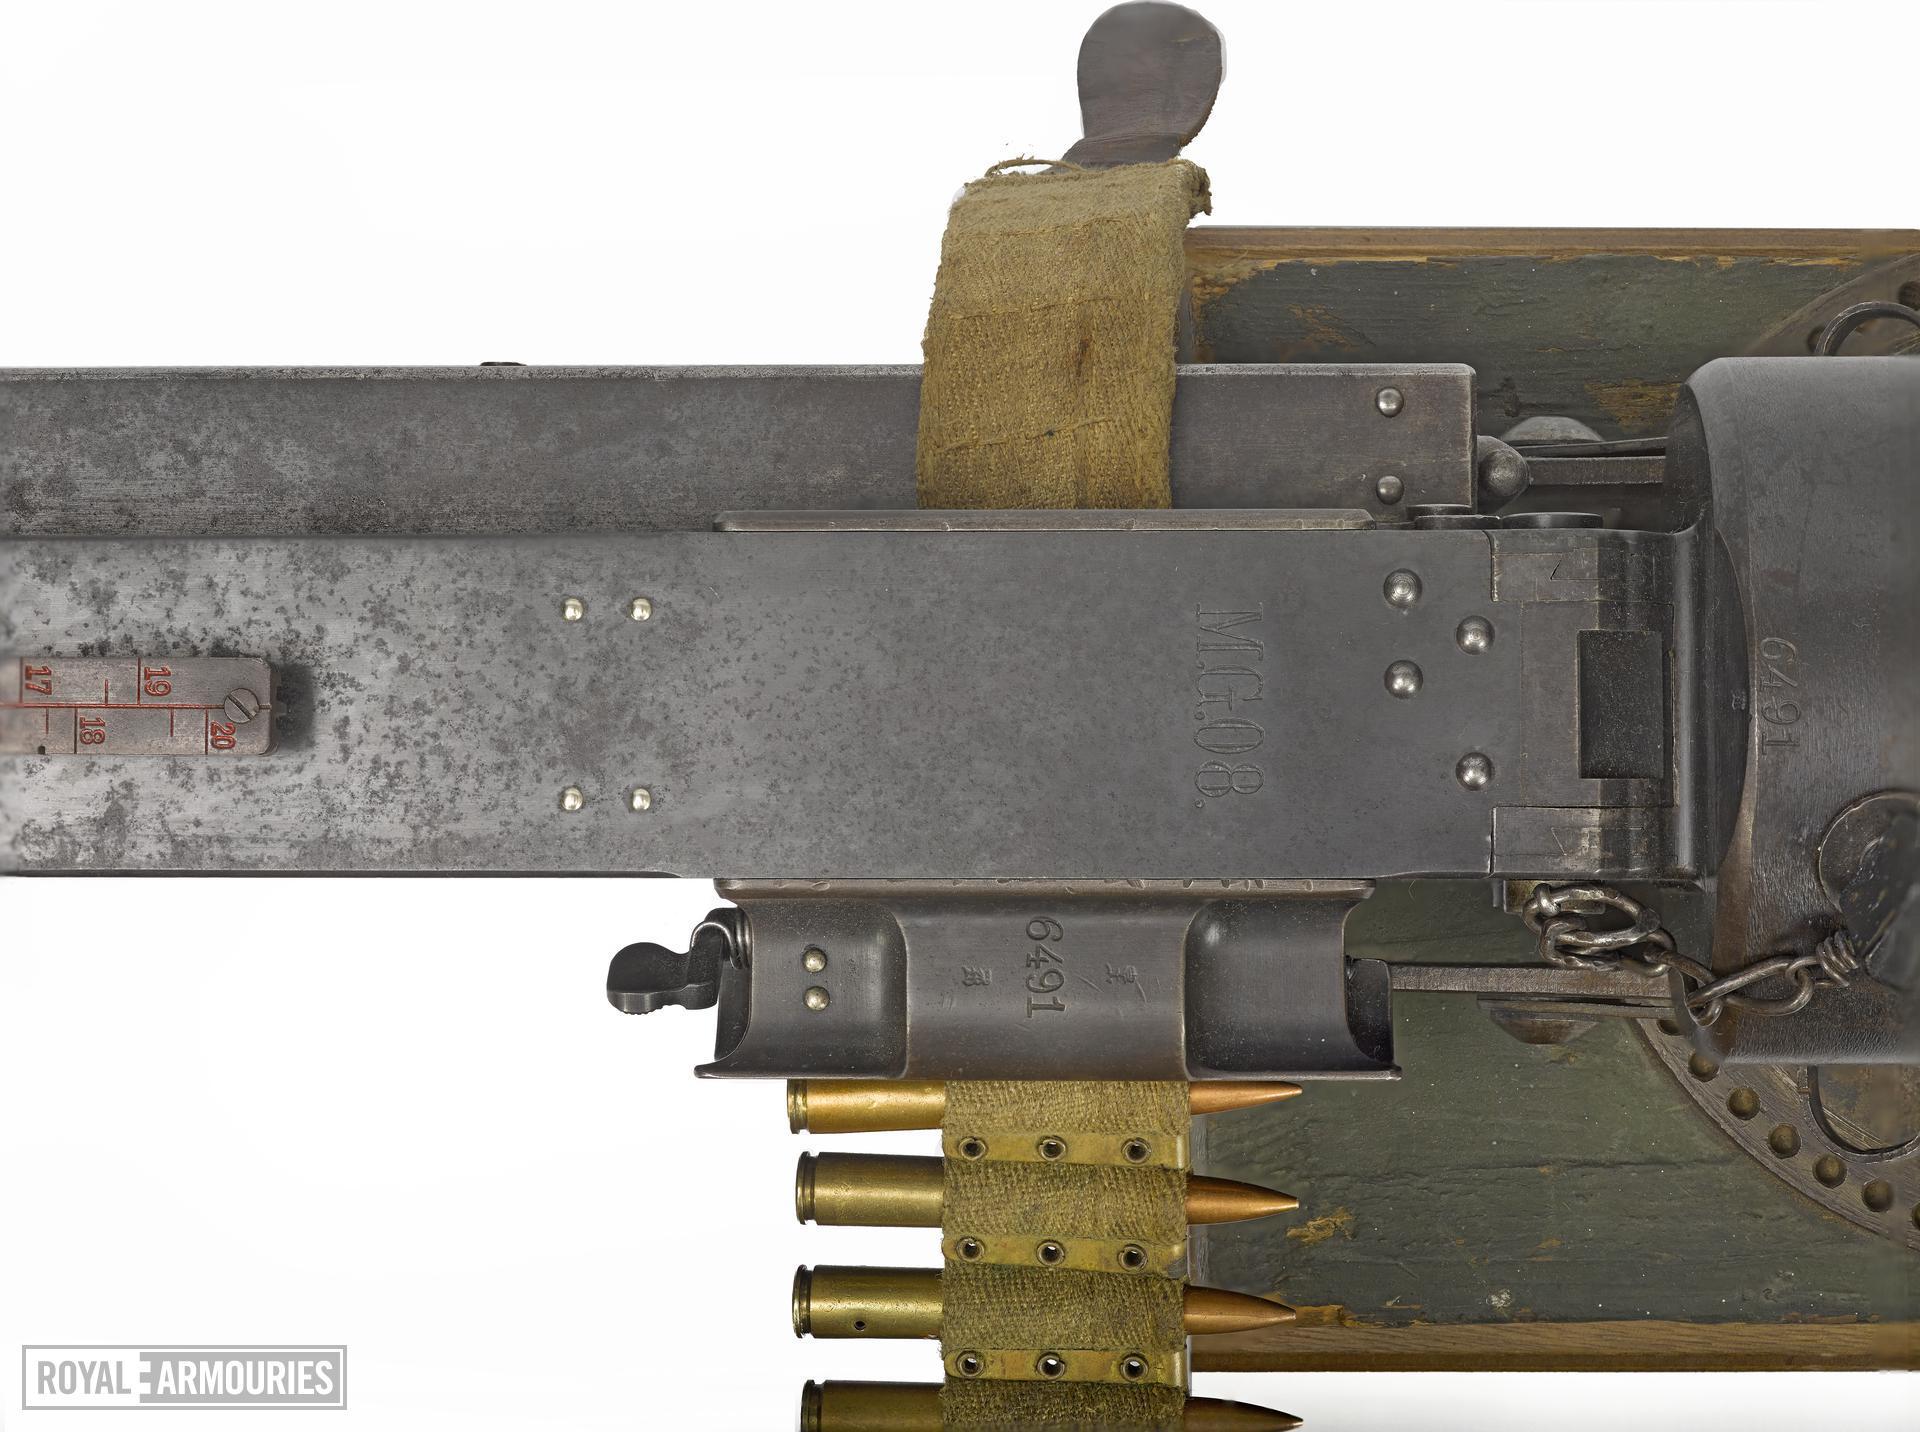 Centrefire automatic machine gun - Maxim MG08